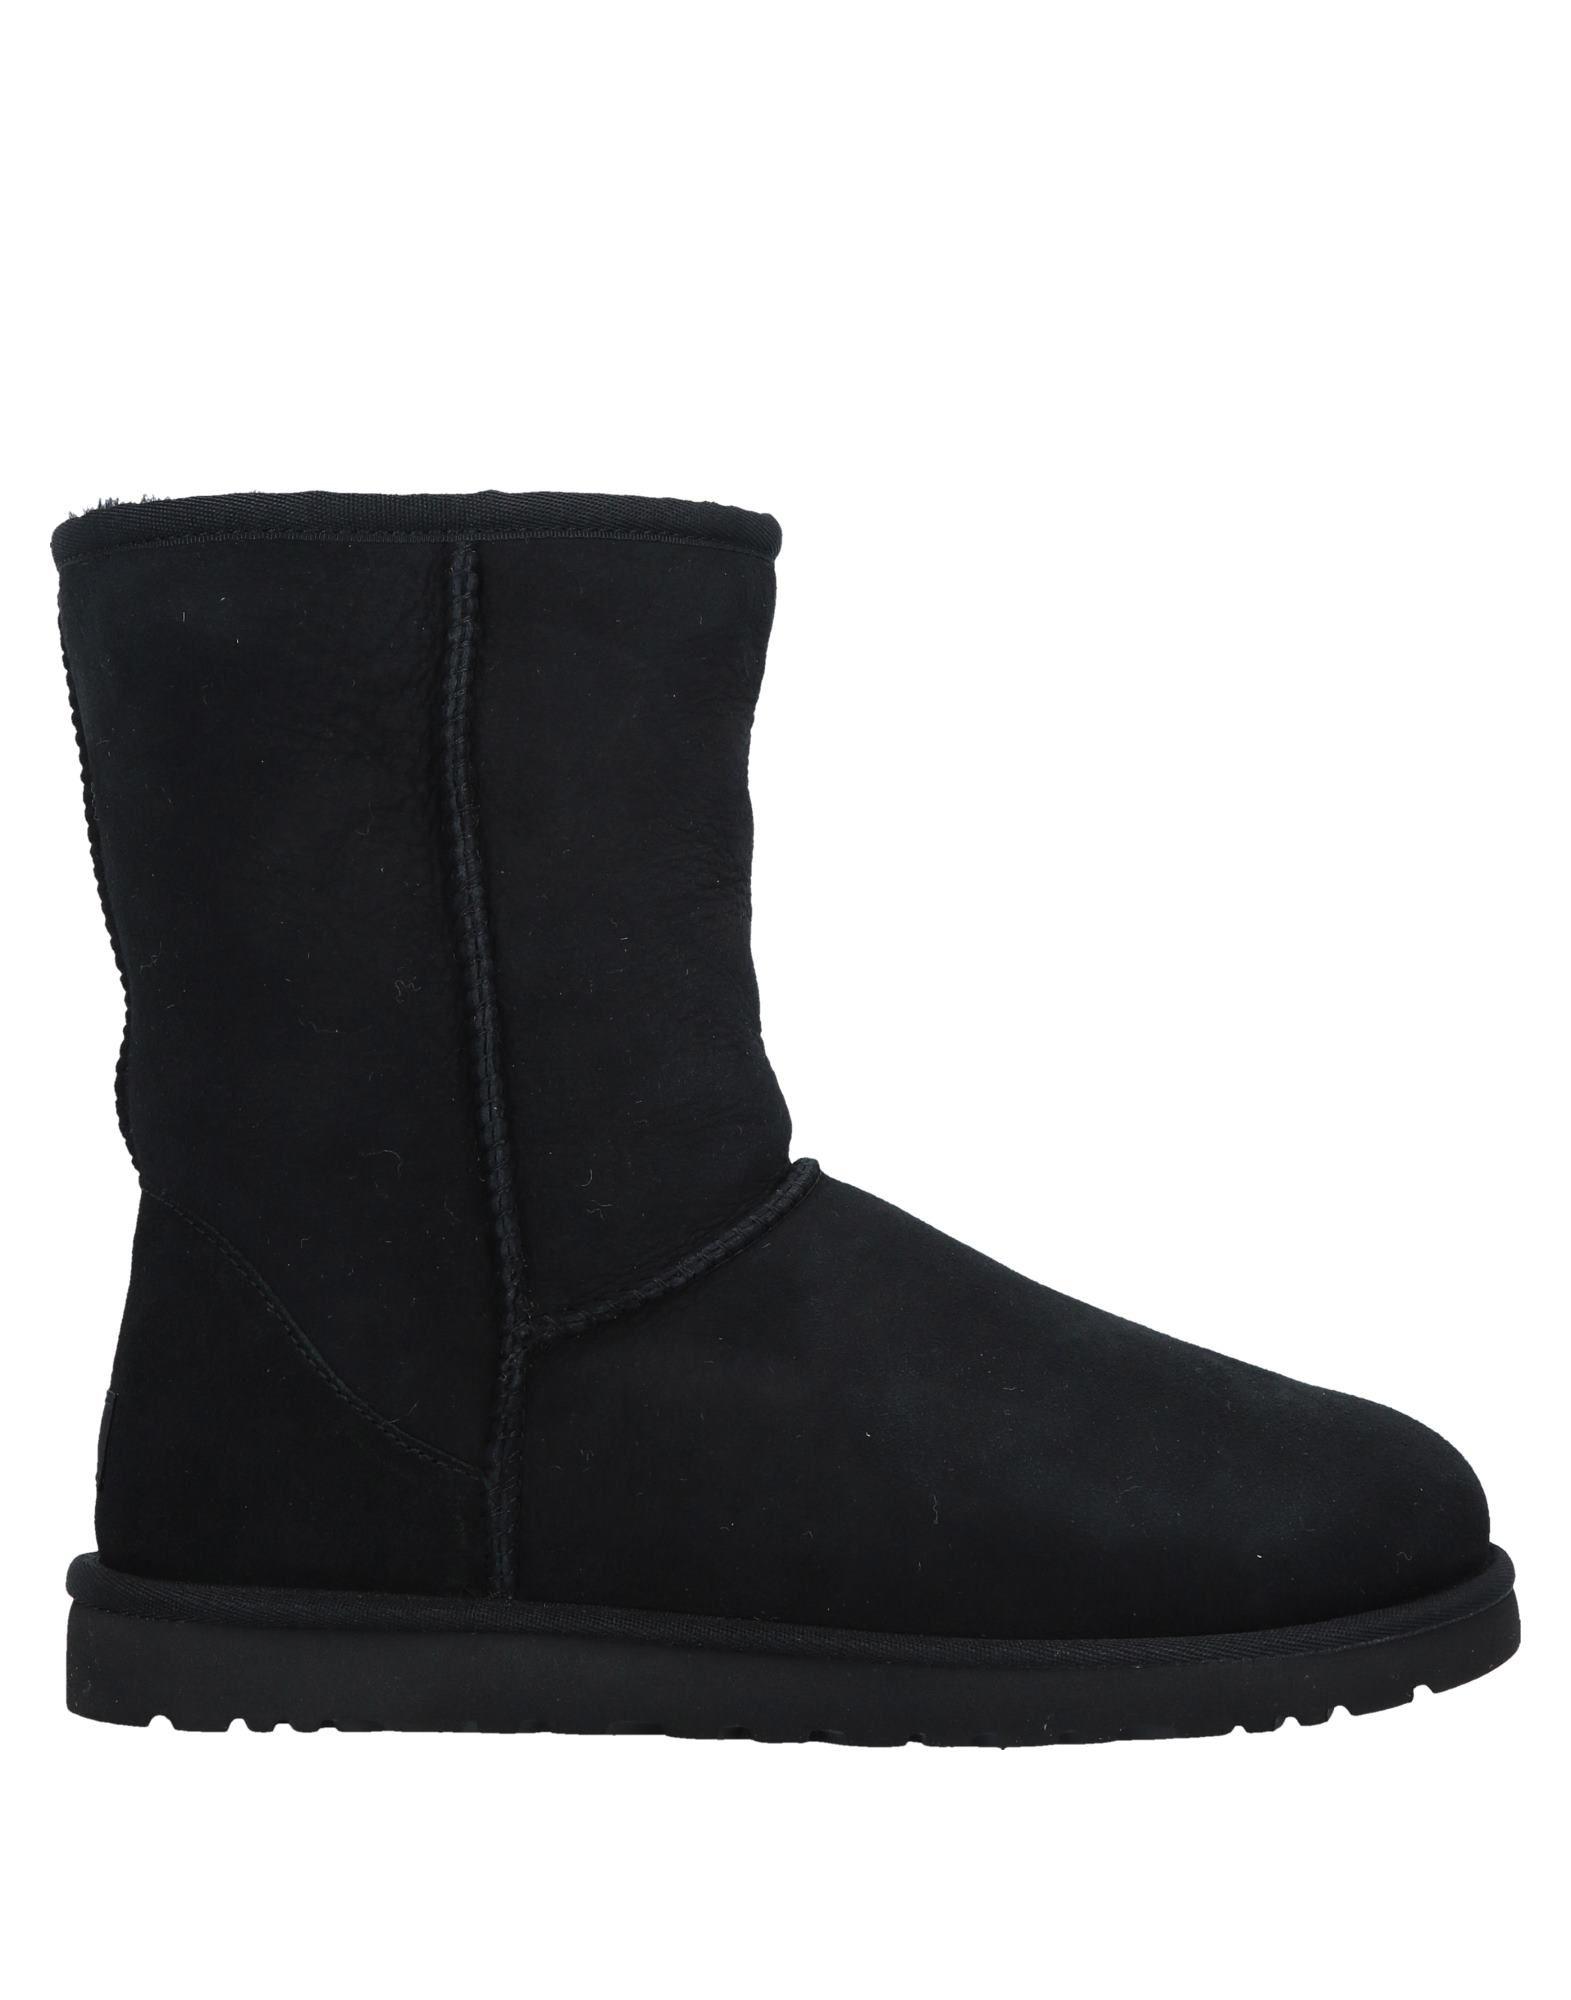 UGG AUSTRALIA Сапоги ugg classic short pink $123 00 ugg boots outlet online uggbootsonsale co